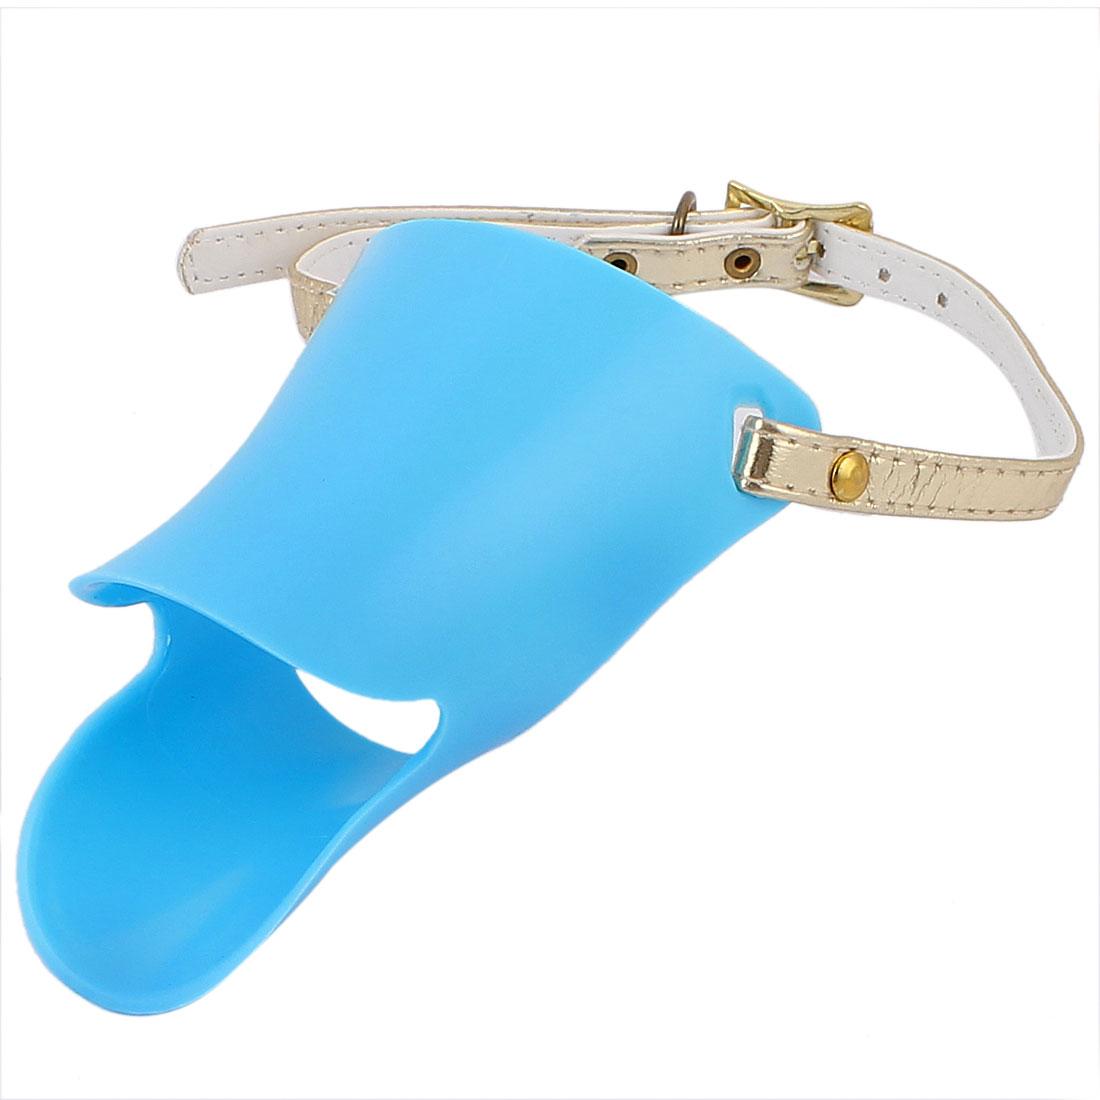 Adjustable Strap Plastic Pet Dog Puppy Mouth Mask Muzzle Cover Guard Blue